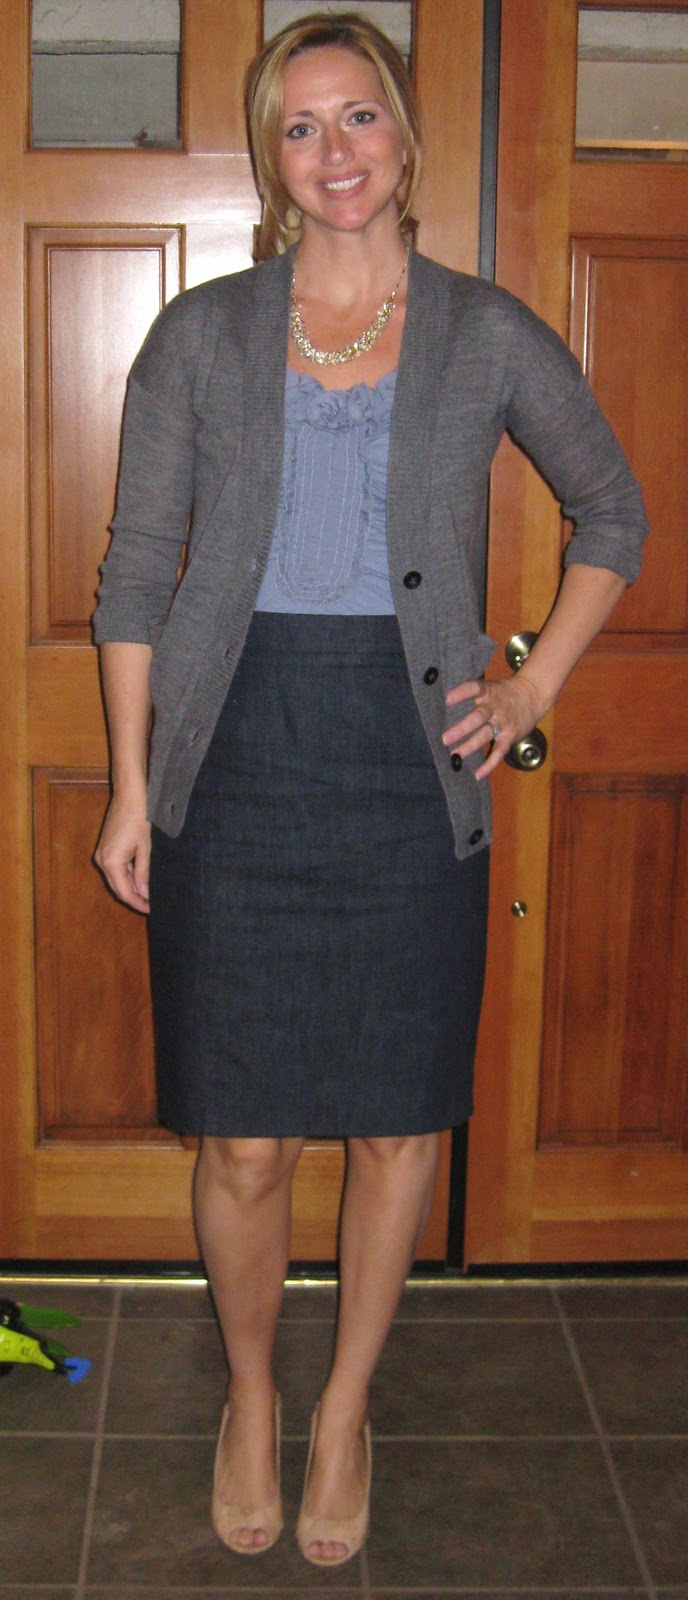 Uncategorized Modestly Styled modestly styled me november 2010 sunday 14 2010